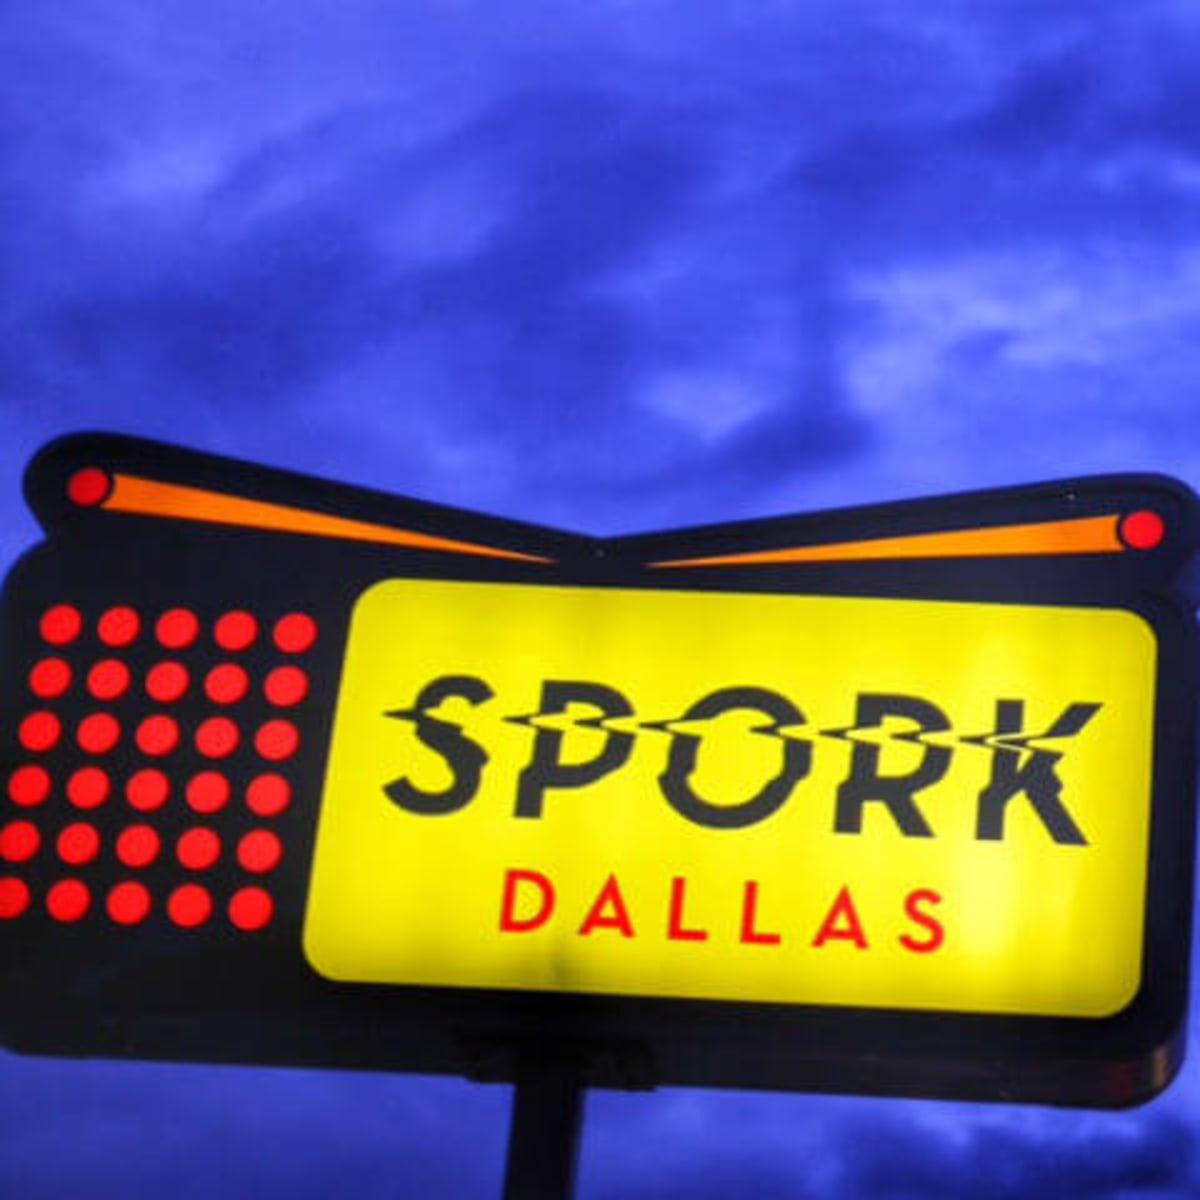 Spork sign